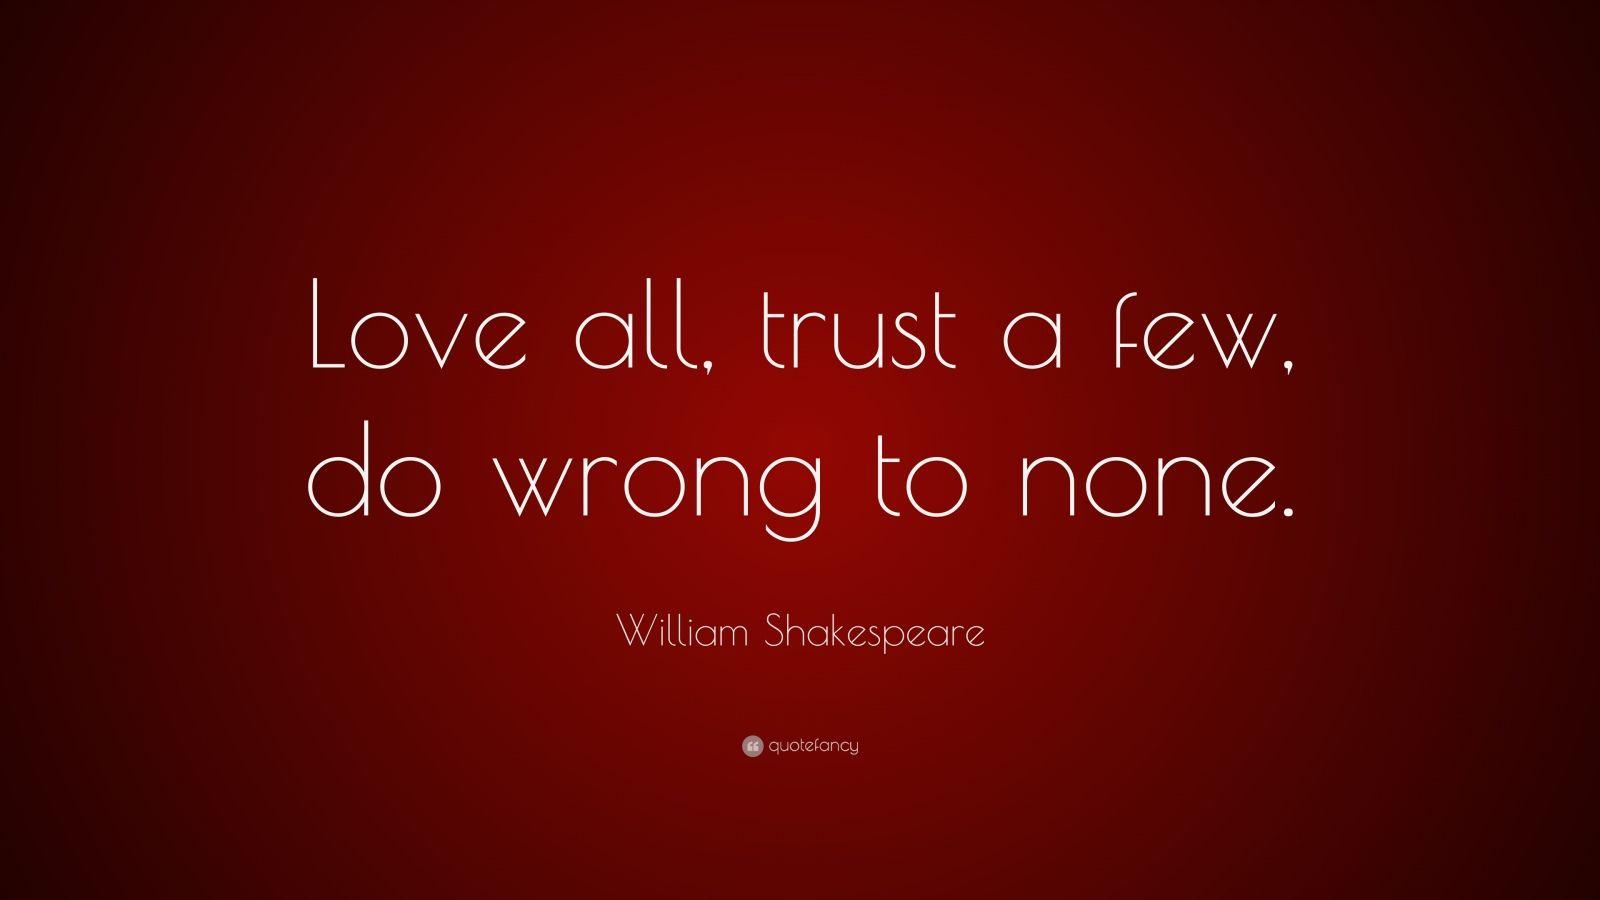 william shakespeare love every faith a new few